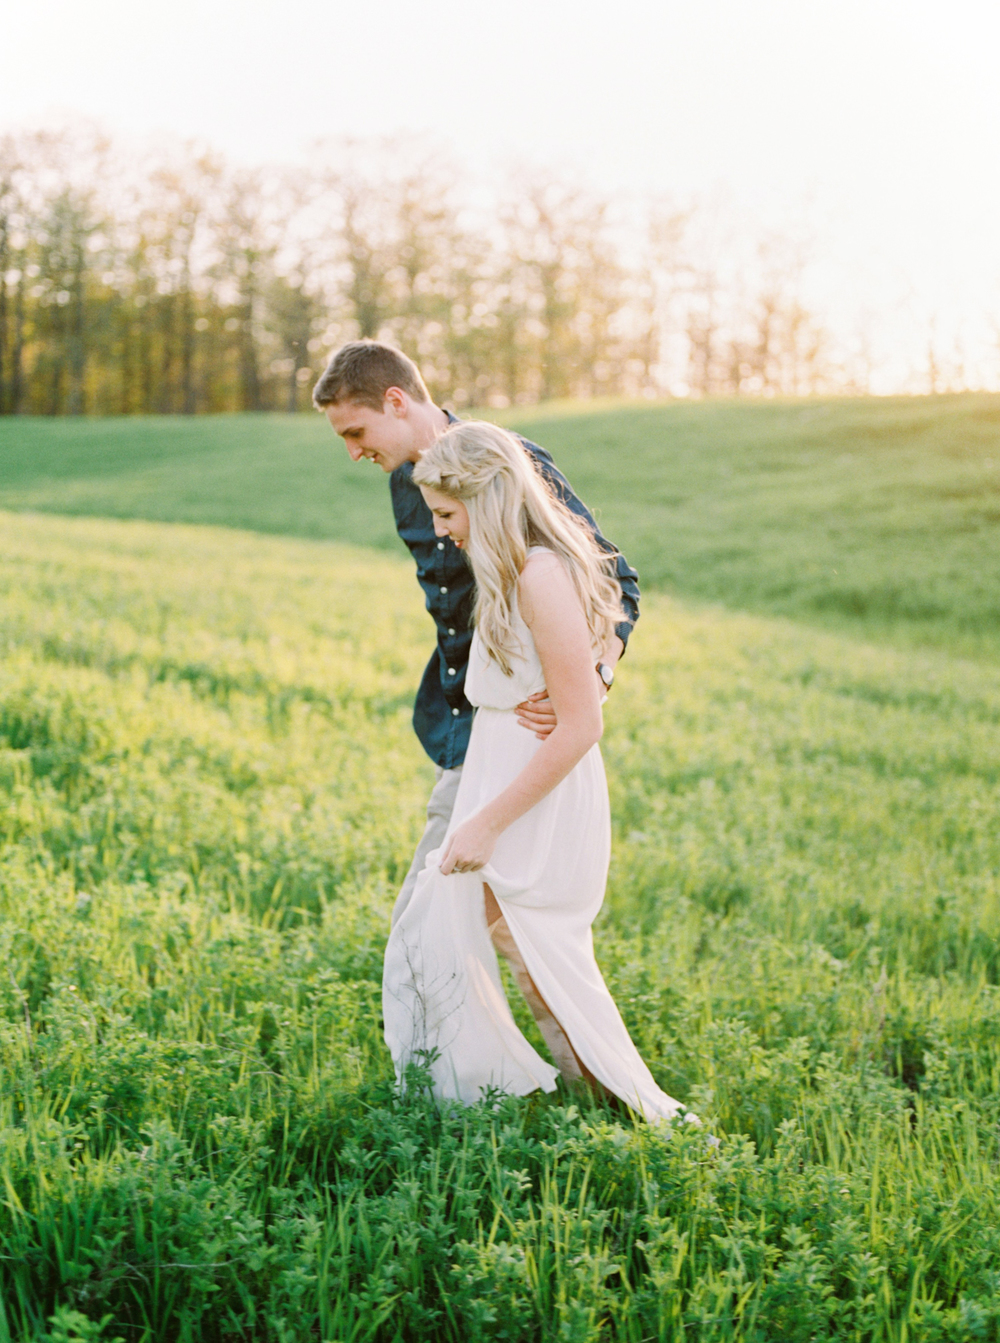 Katie-Nicolle-Niagara-Toronto-Muskoka-Wedding-5.jpg